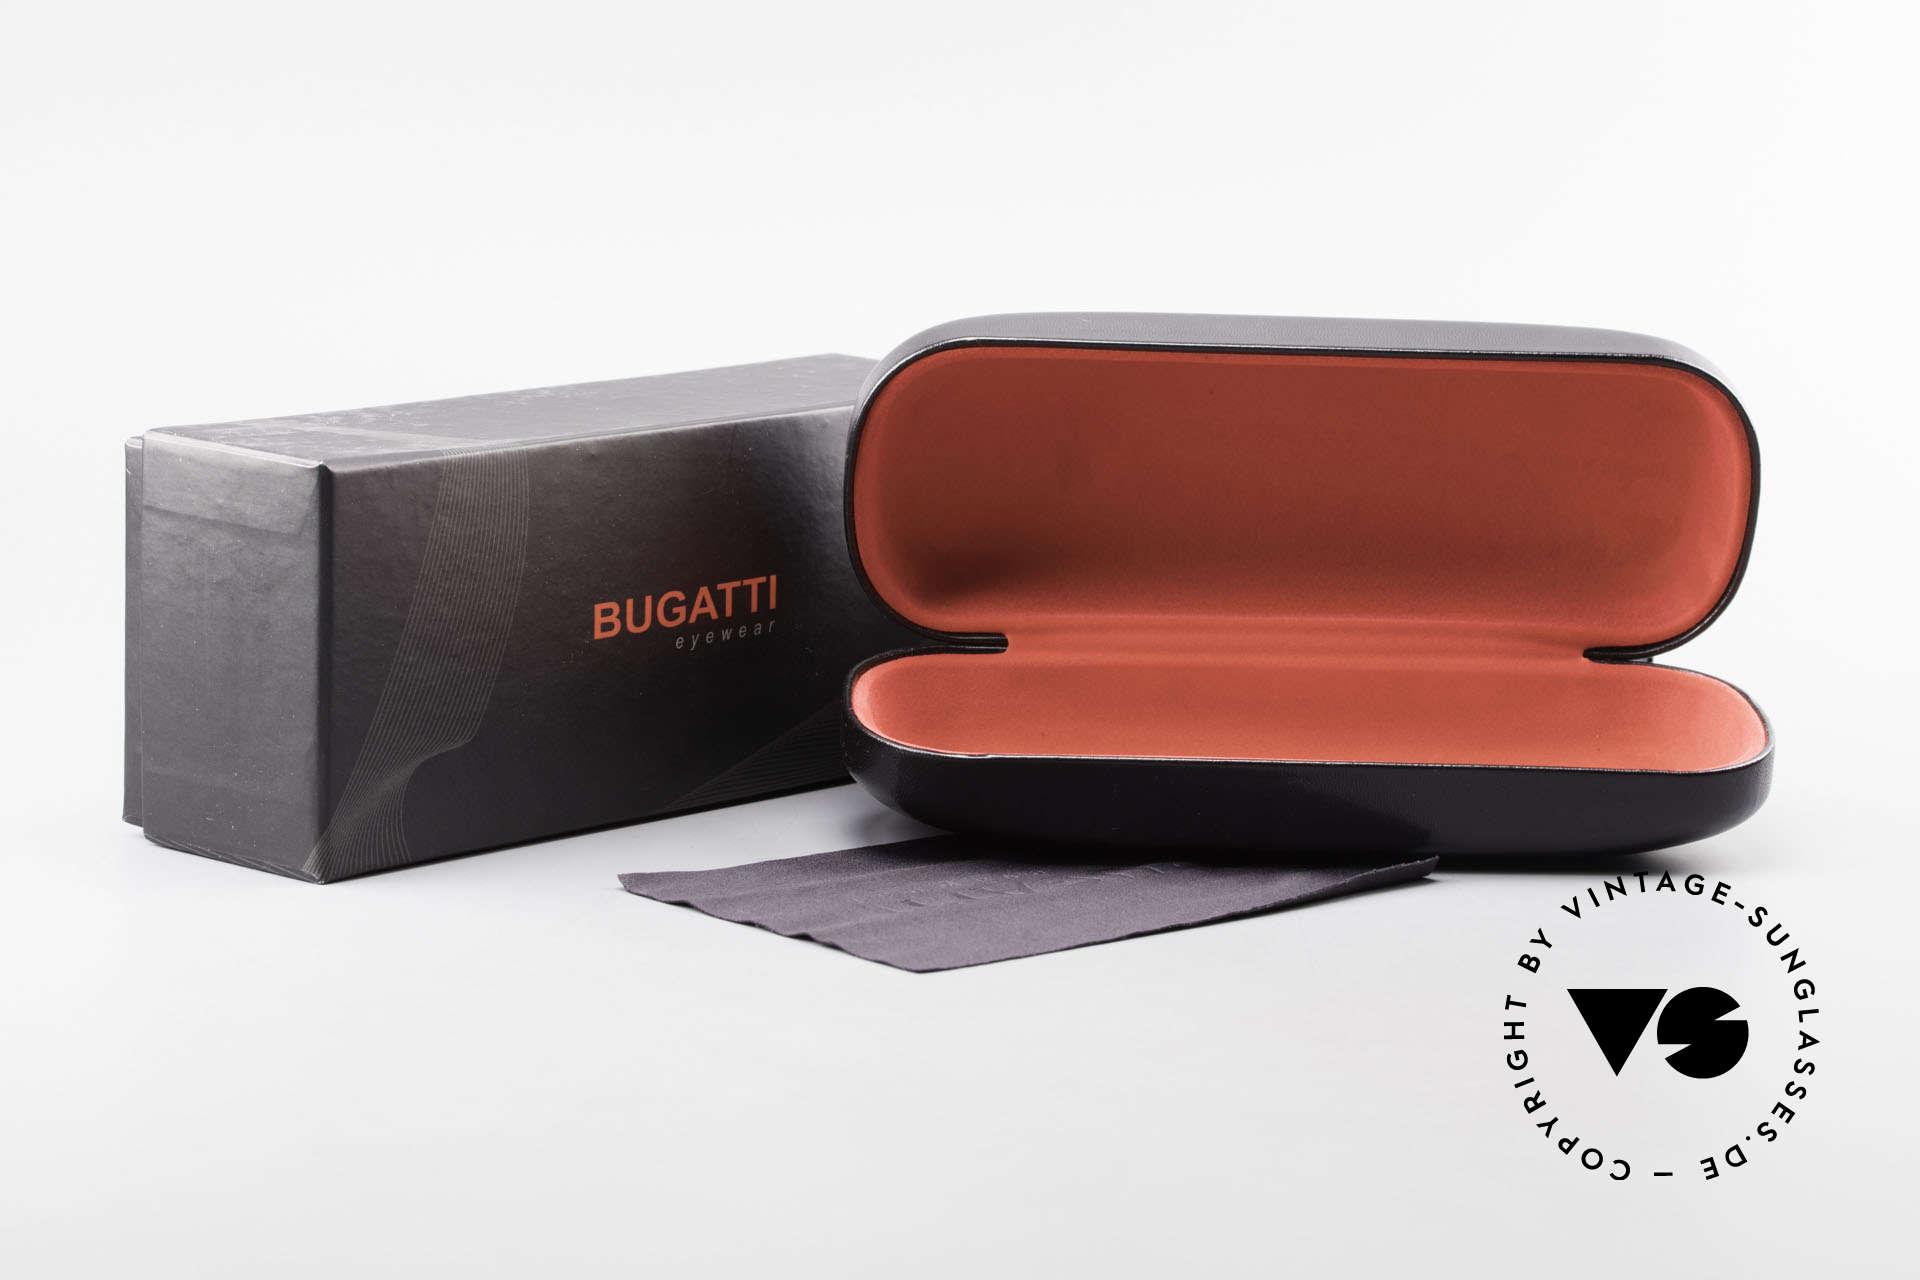 Bugatti 547 Precious Ebony Palladium M, Size: medium, Made for Men